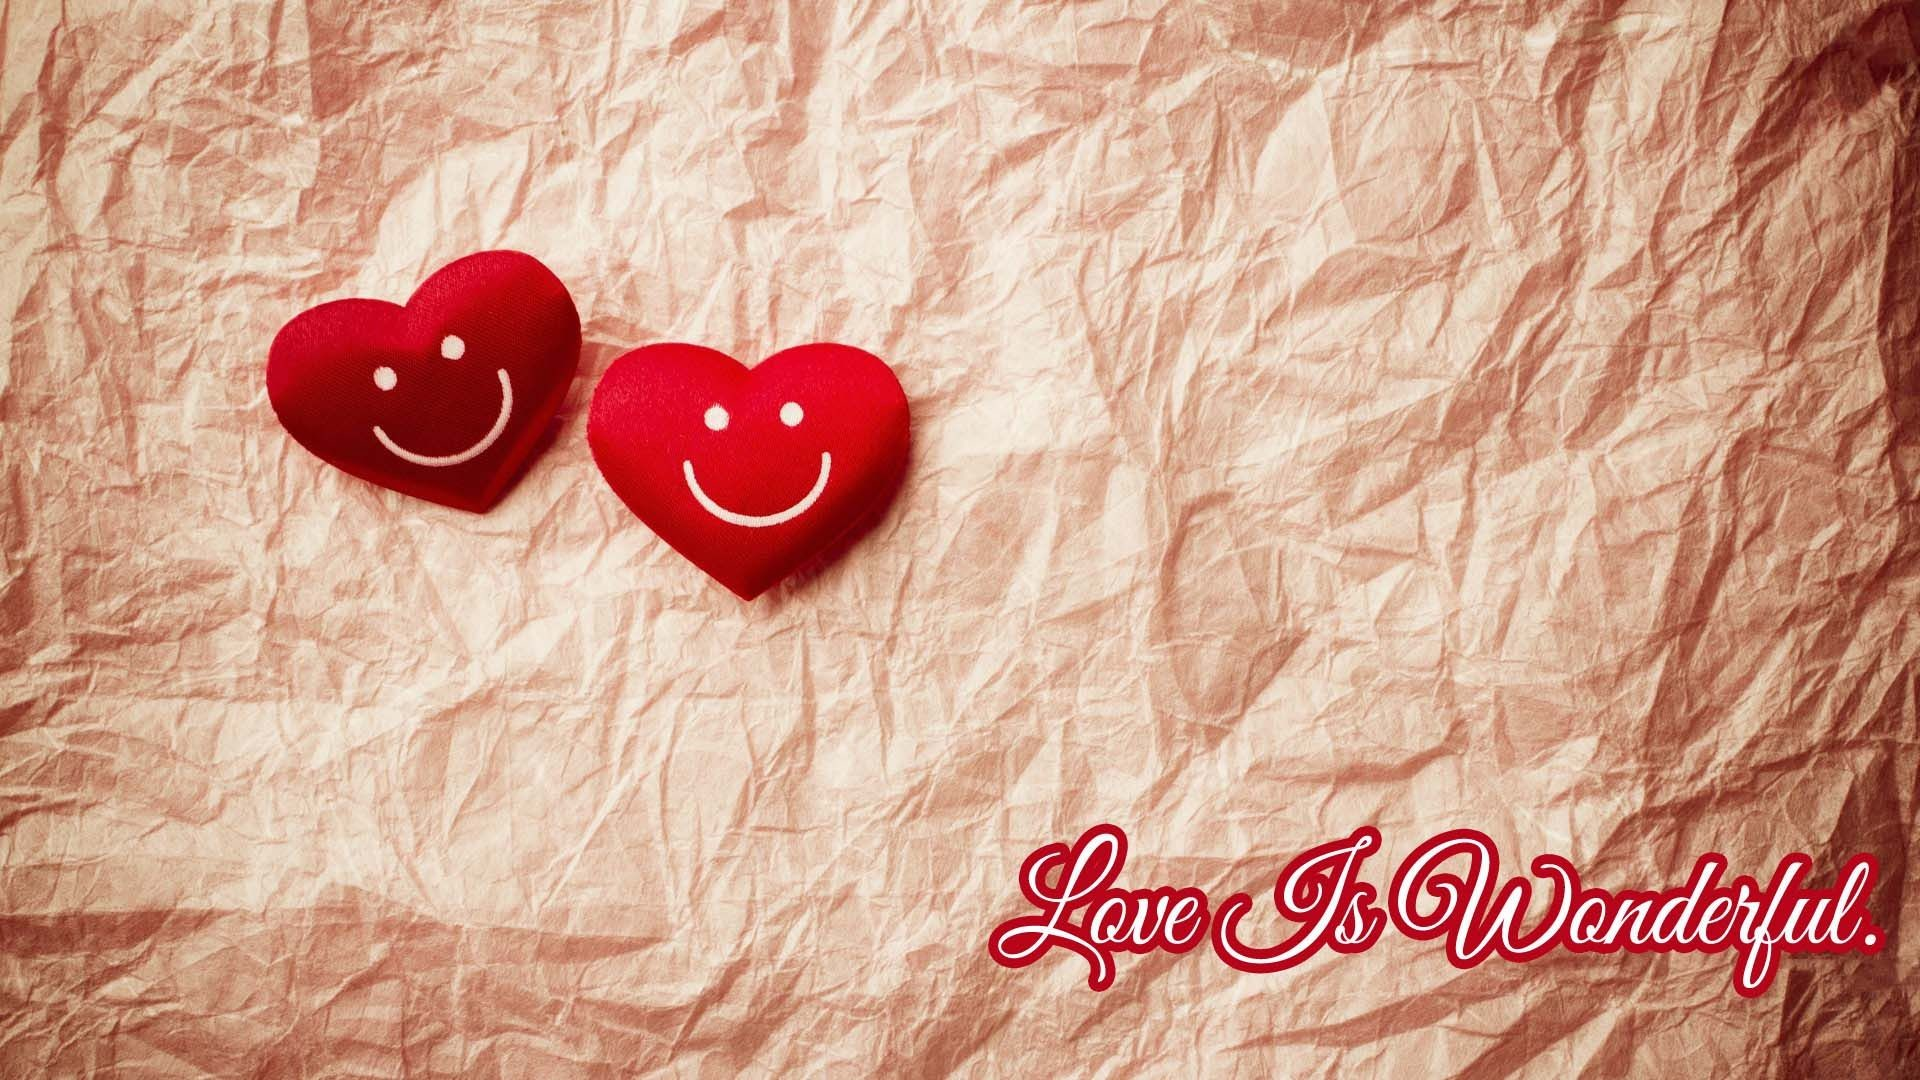 Cute I Love You - Cute I Love You Wallpaper For Mobile - HD Wallpaper